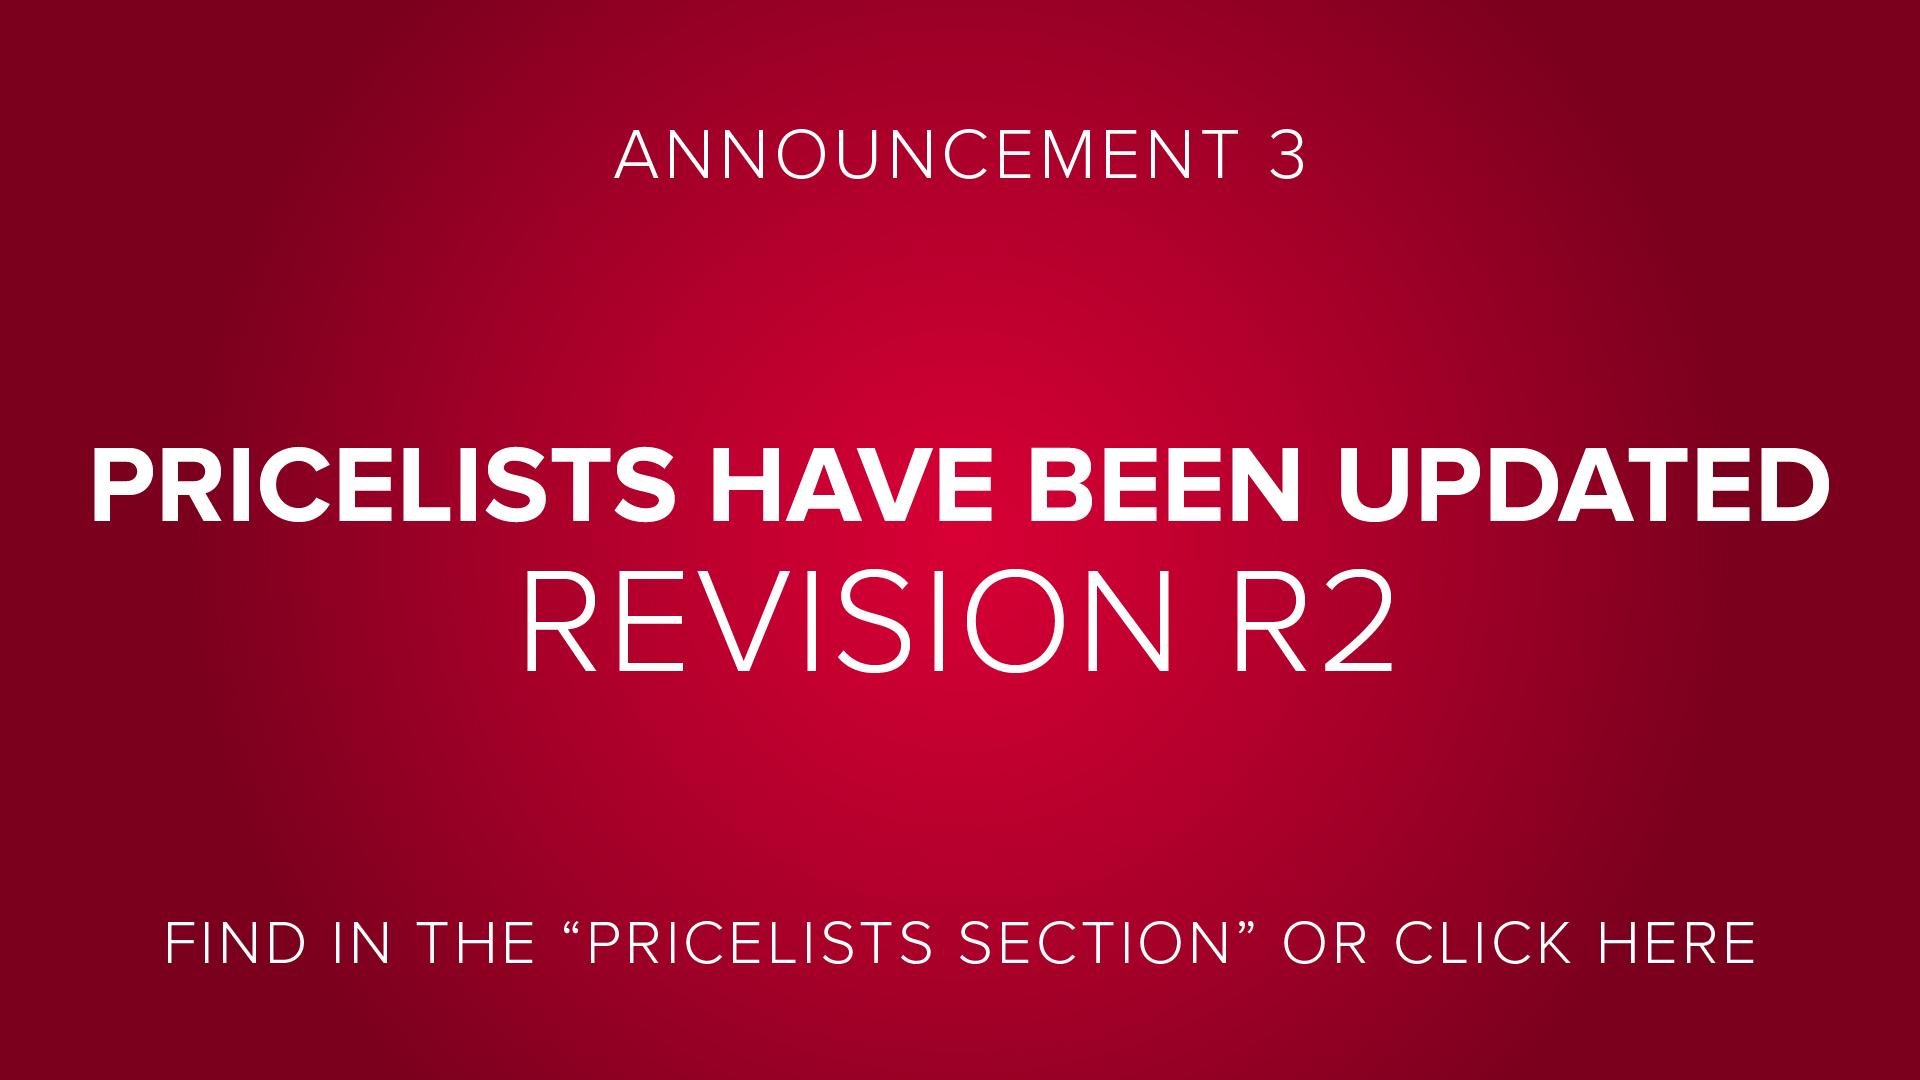 Announcement Buttons_03 Pricelist Updates to R2.jpg